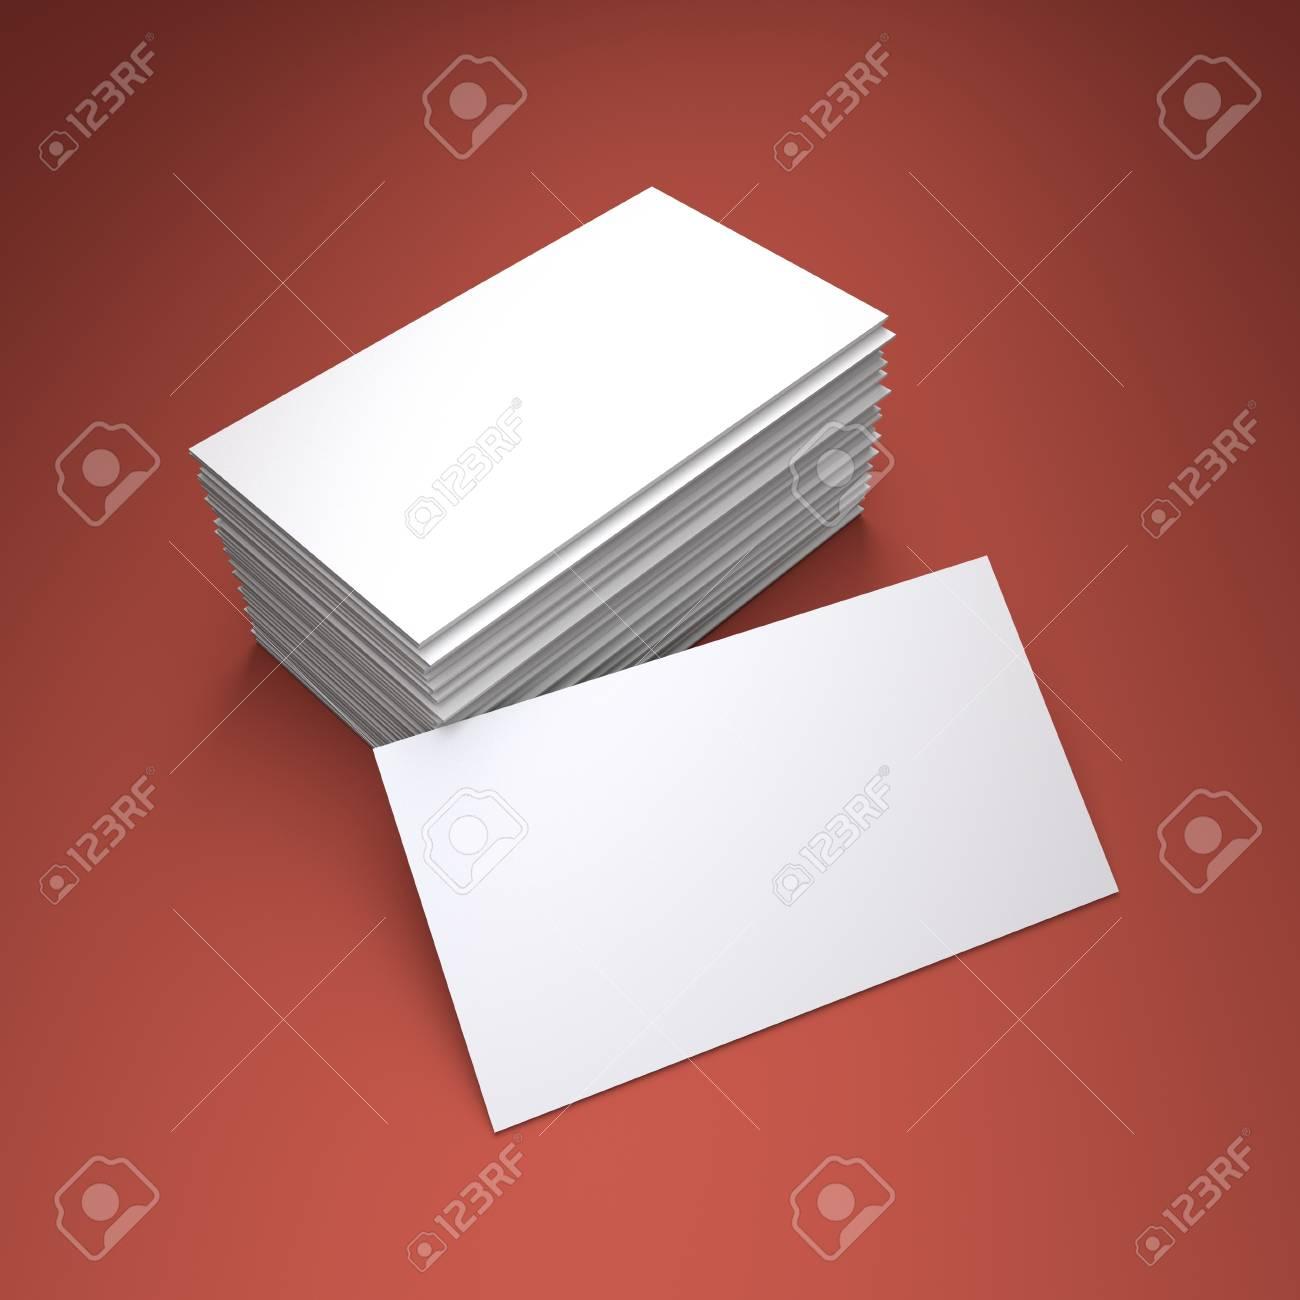 Printable Bingo Card - Free blank - Apollo's Templates Blank photo card stock